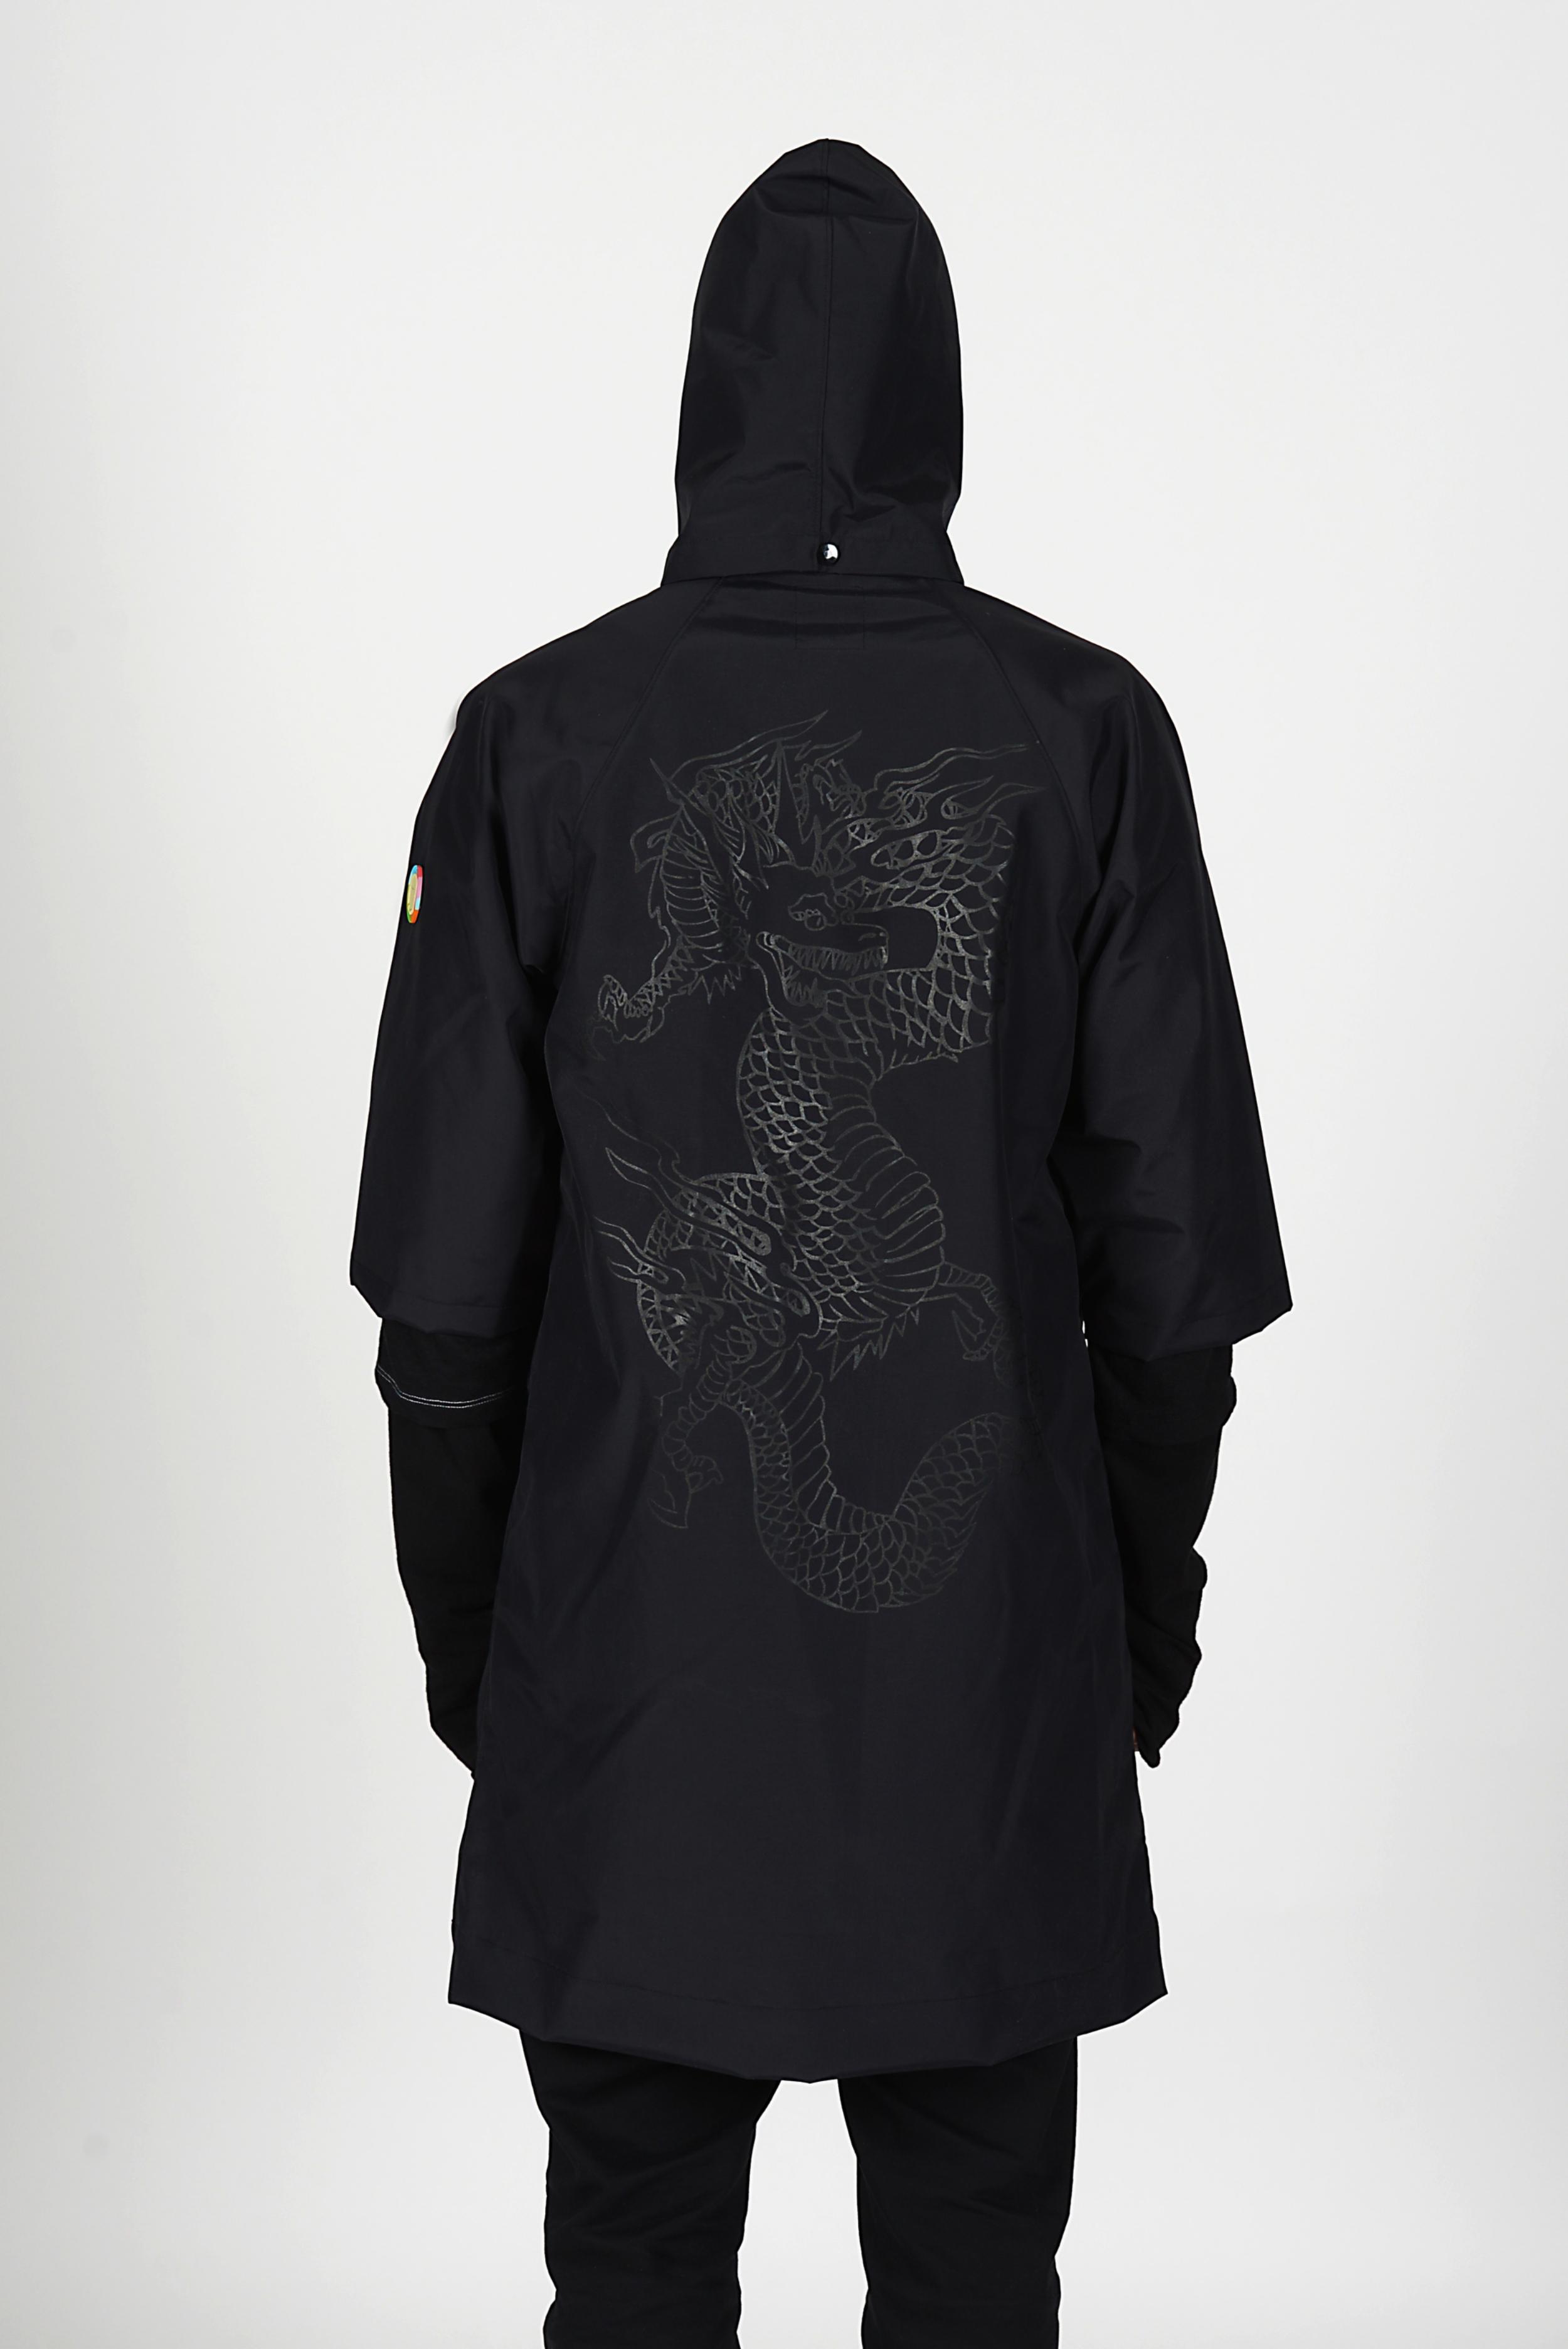 04 Heightened Sense Black Dragon Coat.jpg